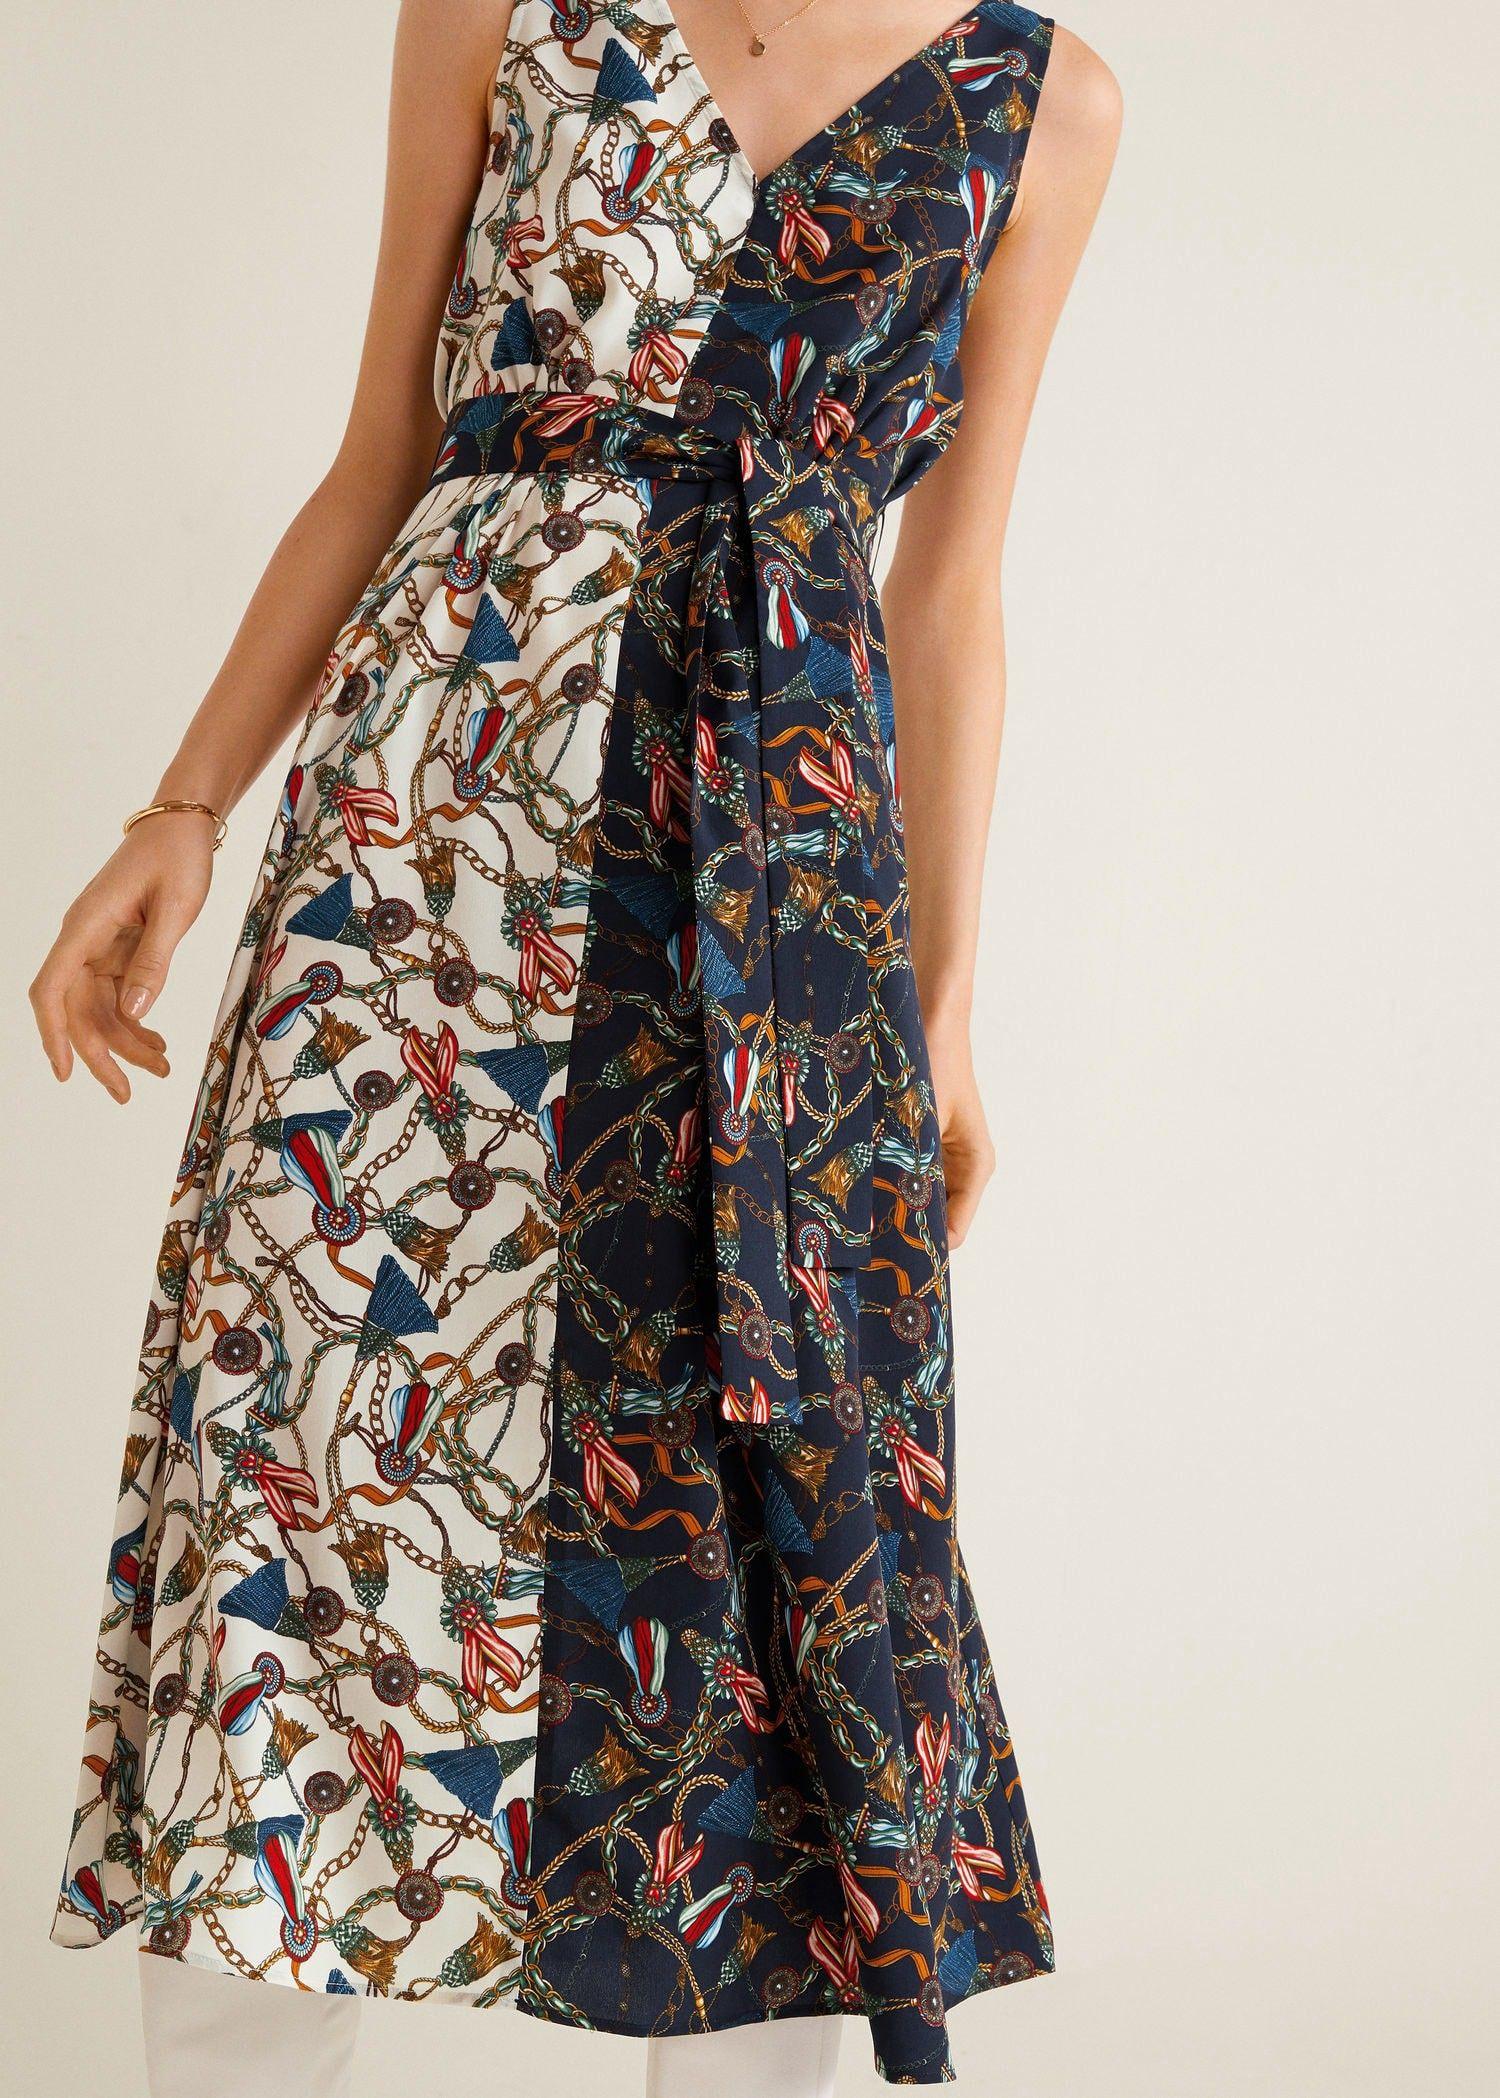 8868ed7ceb Mango Scarf Print Dress - 2 in 2019 | Products | Dresses, Fashion